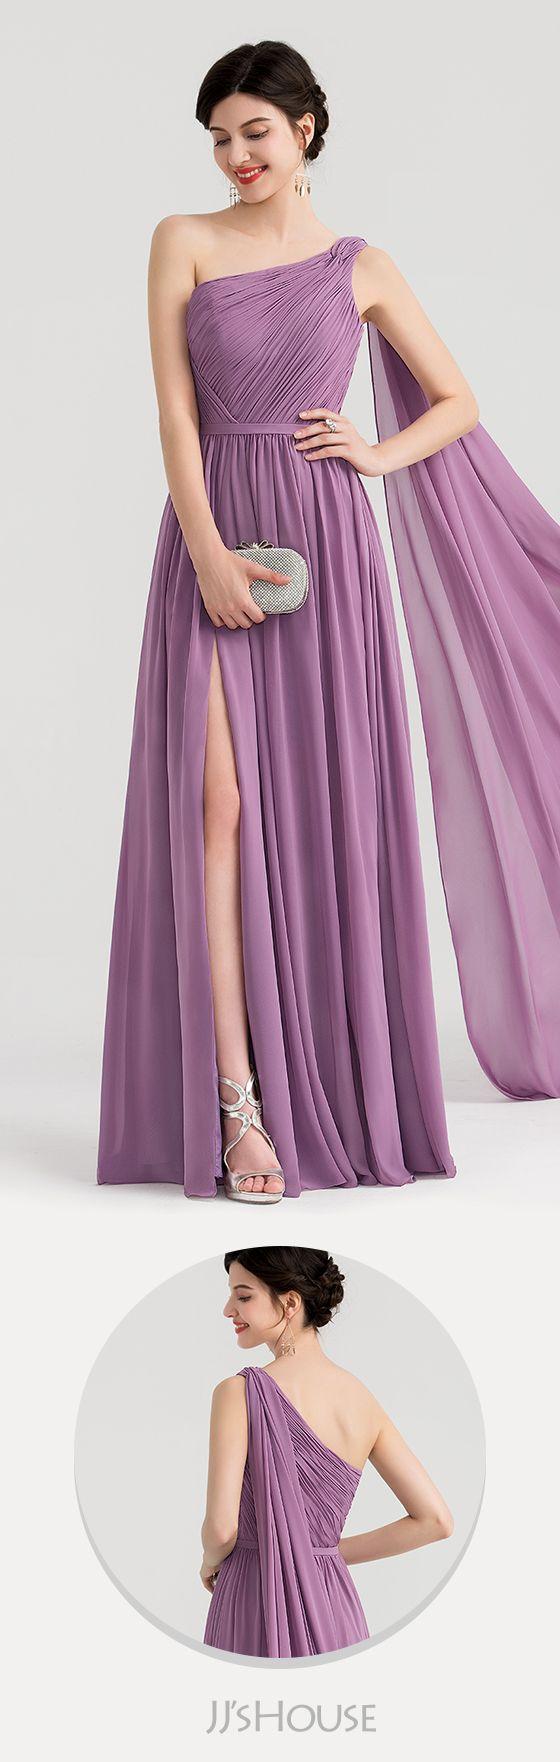 0b6461fb398d A-Line Princess One-Shoulder Floor-Length Chiffon Evening Dress With Ruffle  Split Front  JJsHouse  Evening dresses